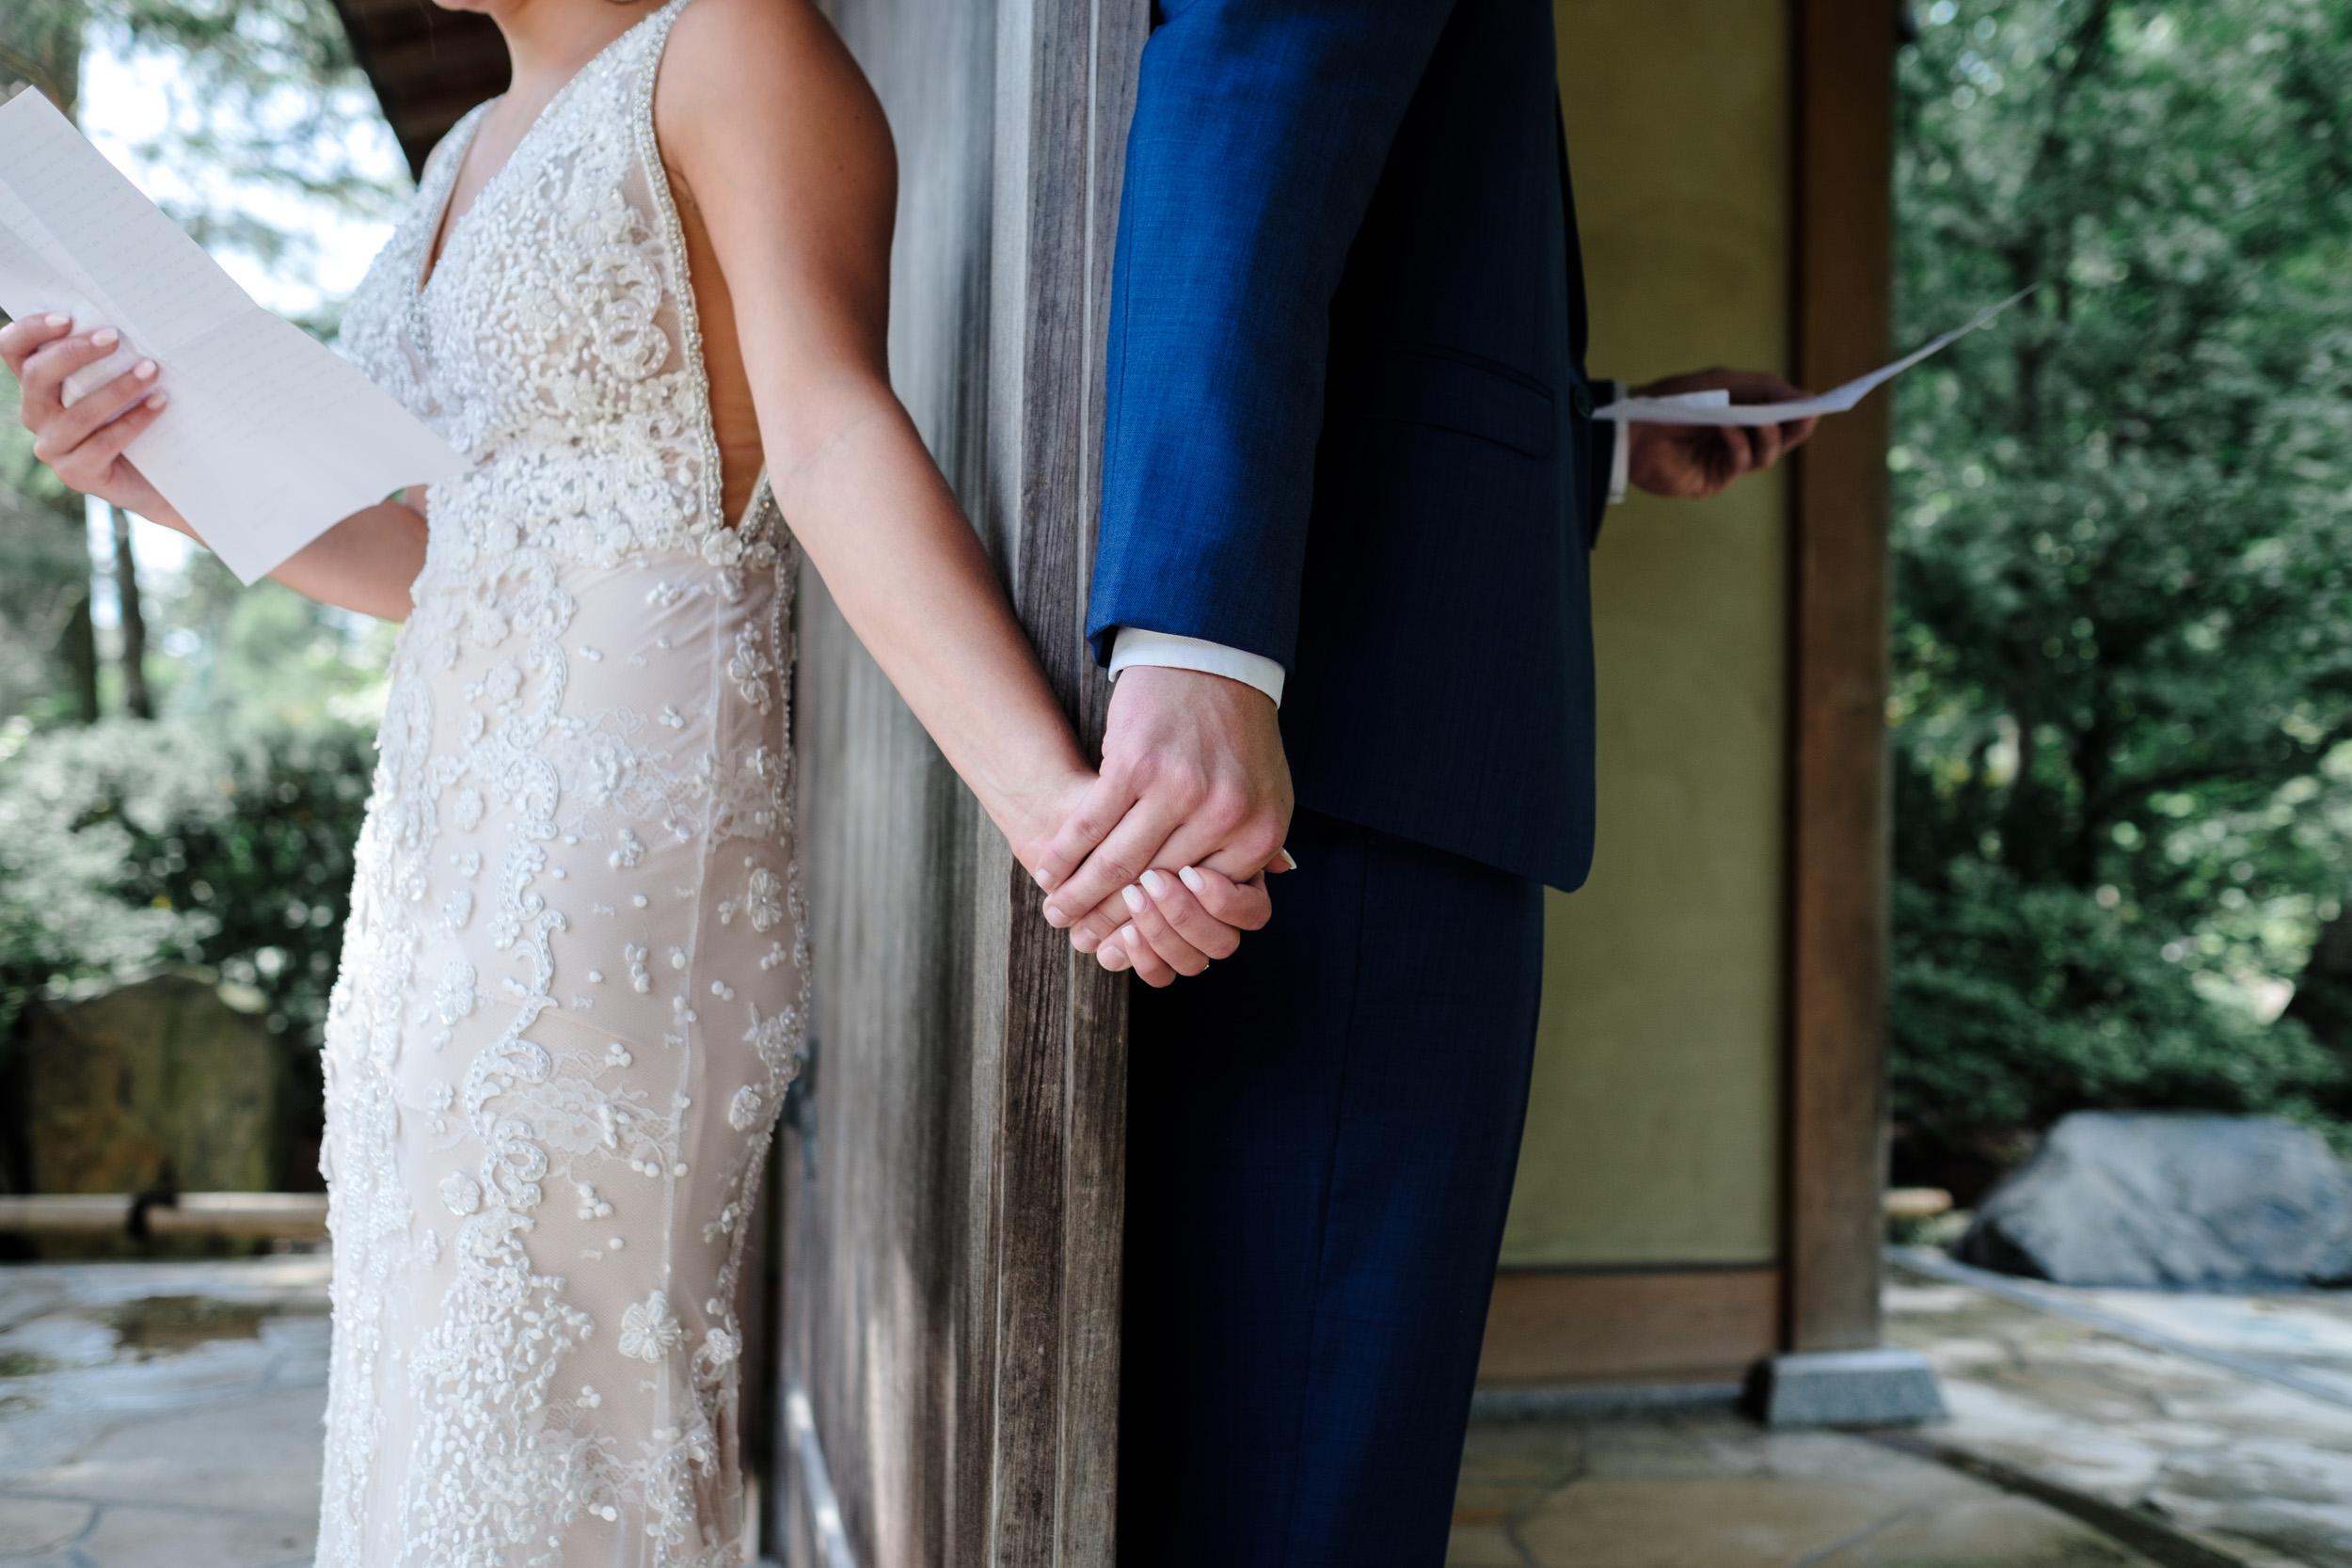 18-09-01 BAP Kiley-Trevor-Anderson-Gardens-Wedding-16.jpg